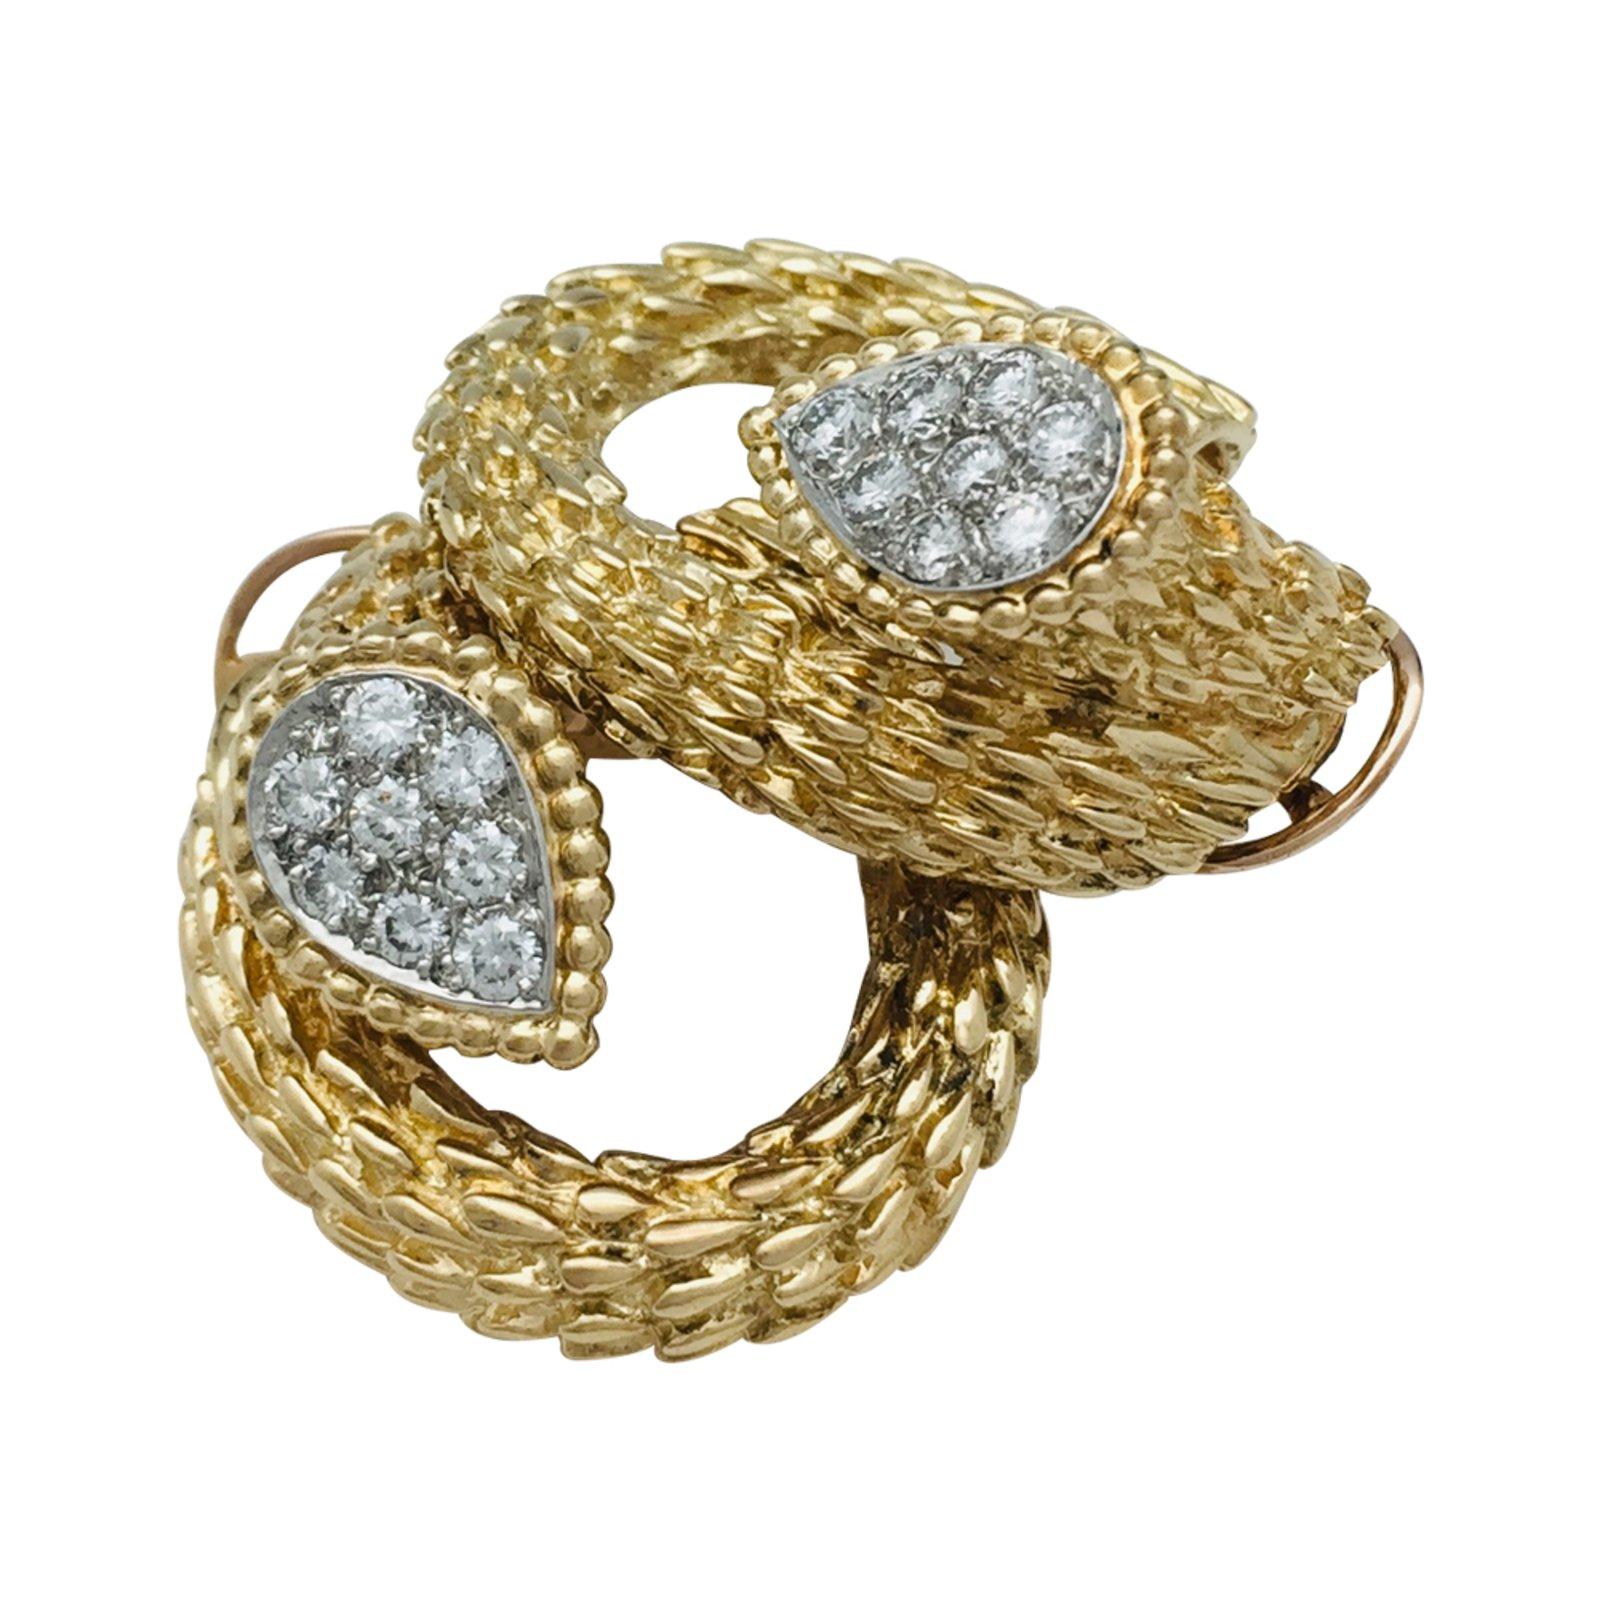 Boucheron Boucheron Earrings Serpent Boheme In Yellow Gold Diamonds Earrings Other Yellow Gold Other Ref 110716 Joli Closet